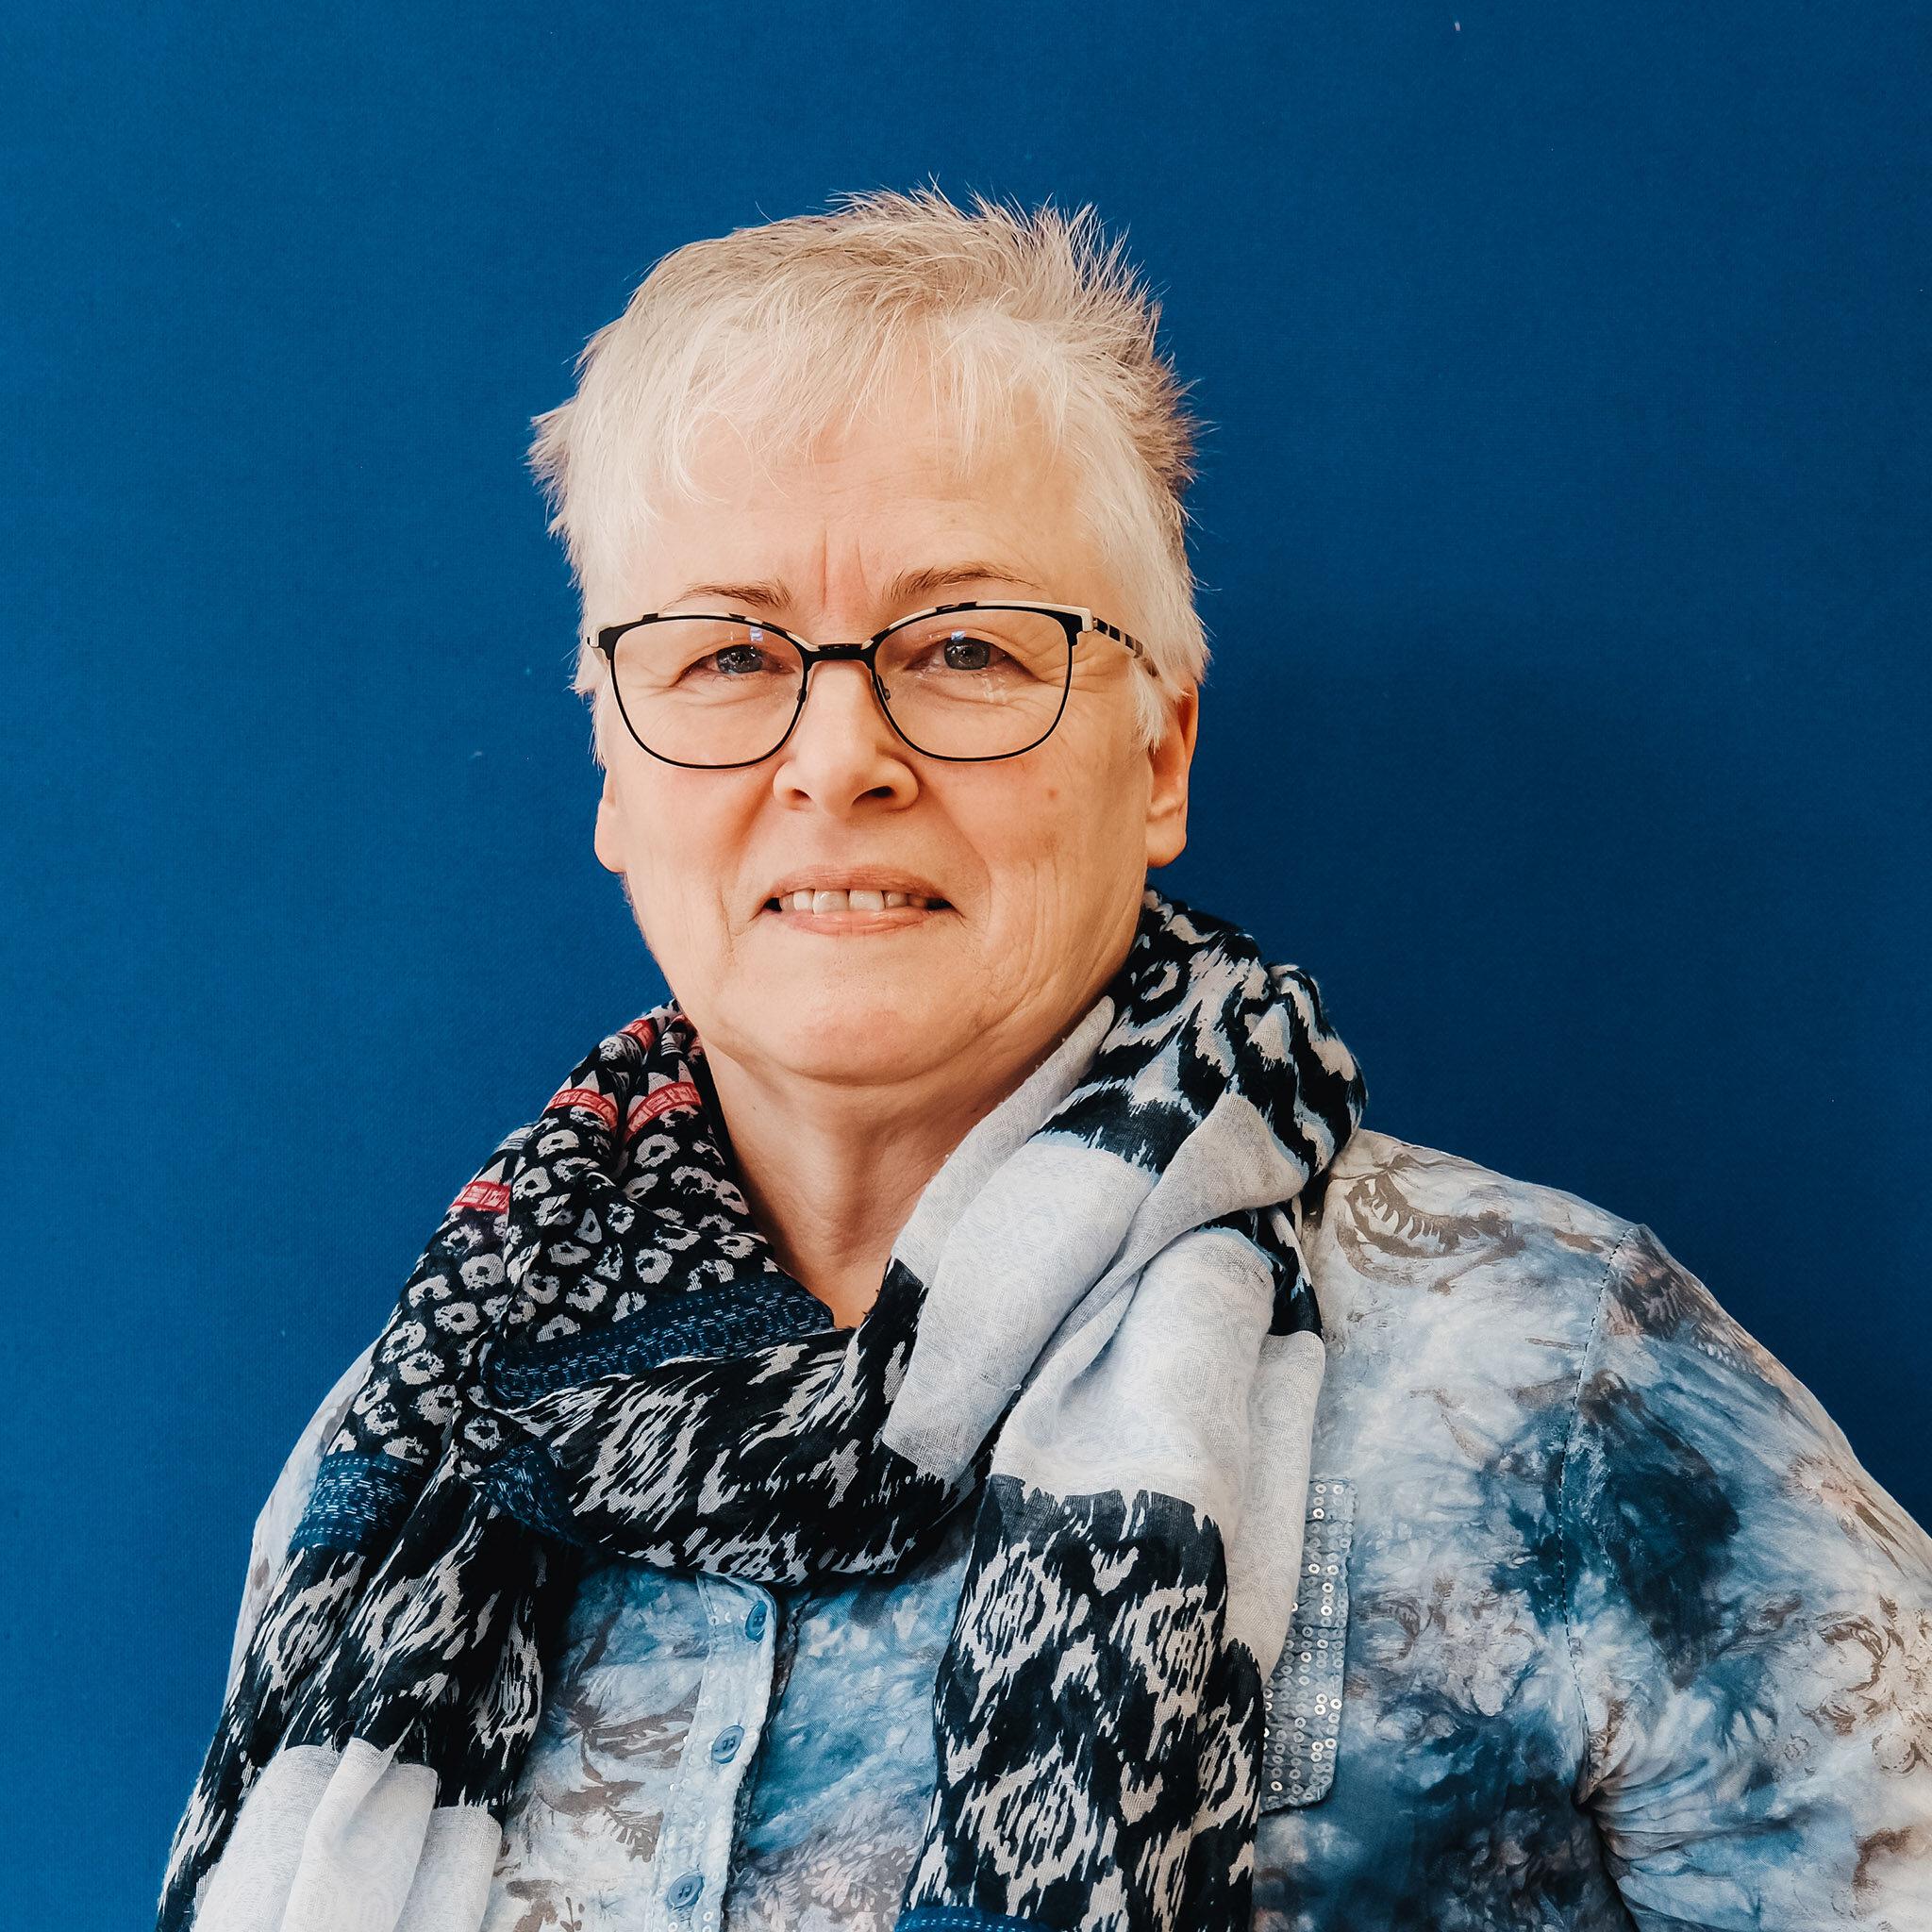 Barbara Beutel